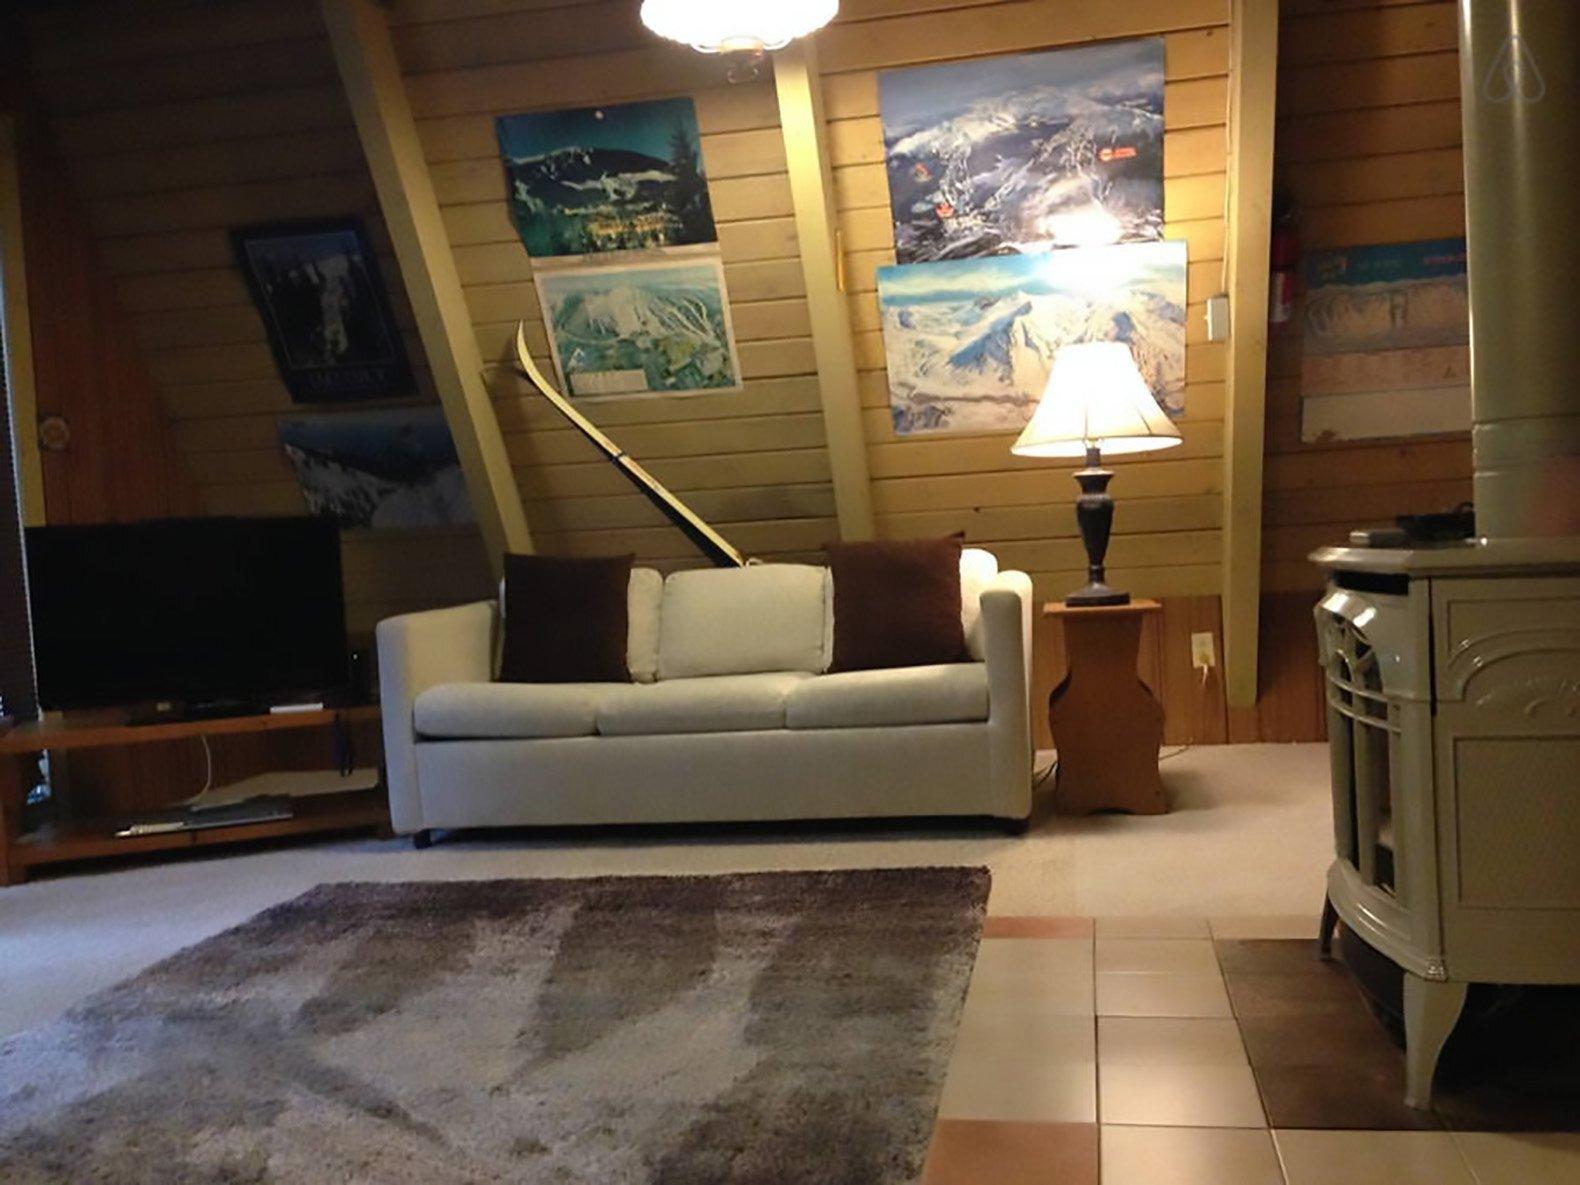 Tye-Haus A-Frame Cabin -  Skykomish Washington - Living Area - Humble Homes